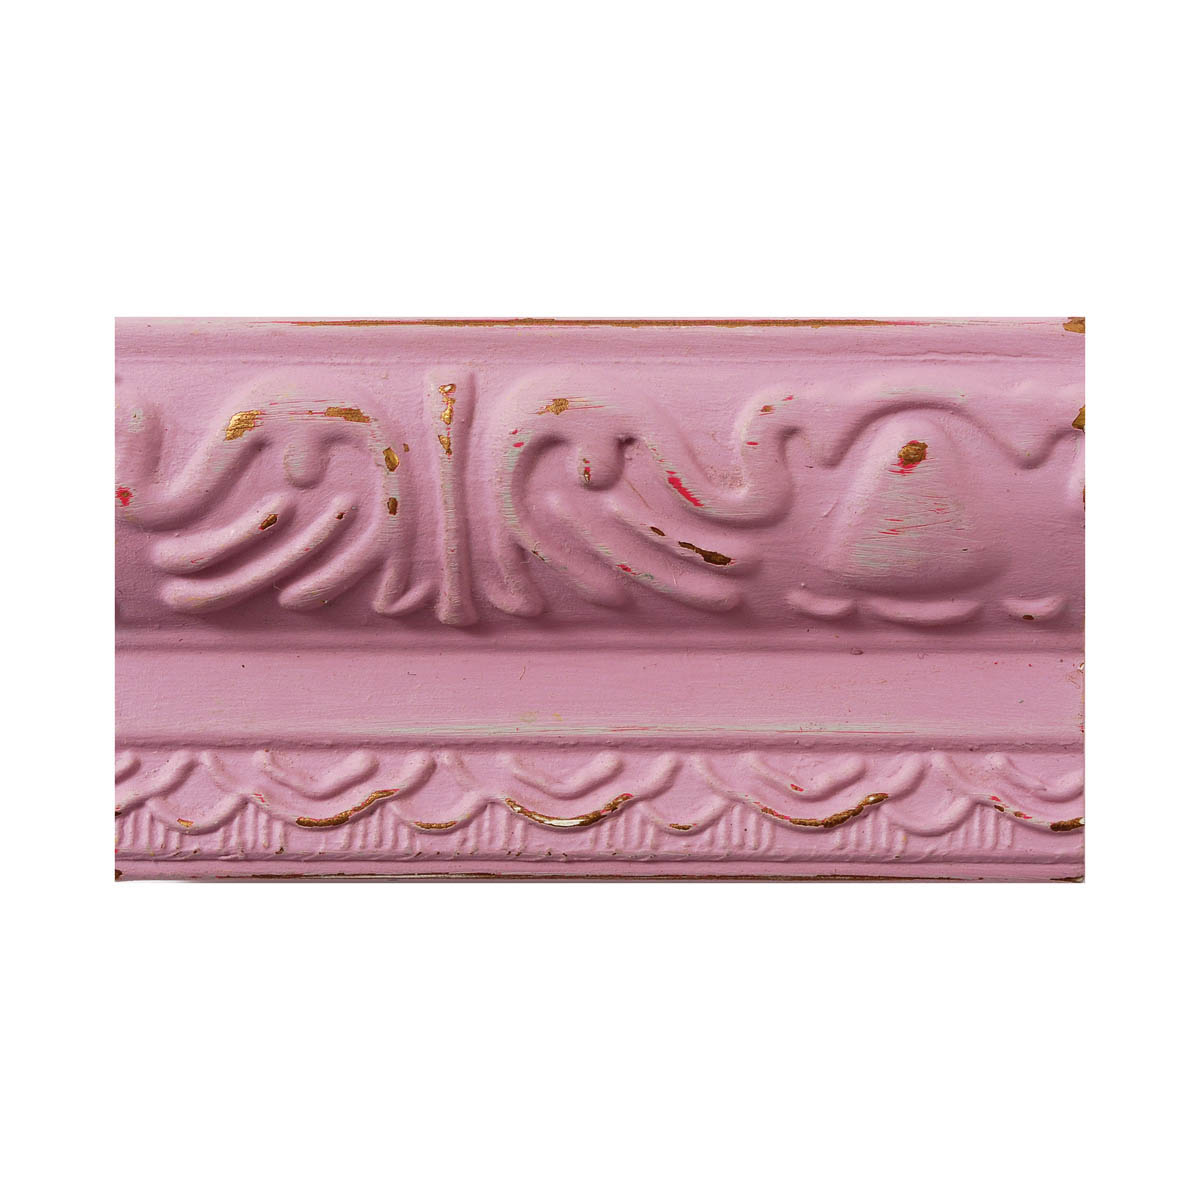 FolkArt ® Home Decor™ Chalk - Lilac, 8 oz. - 34163